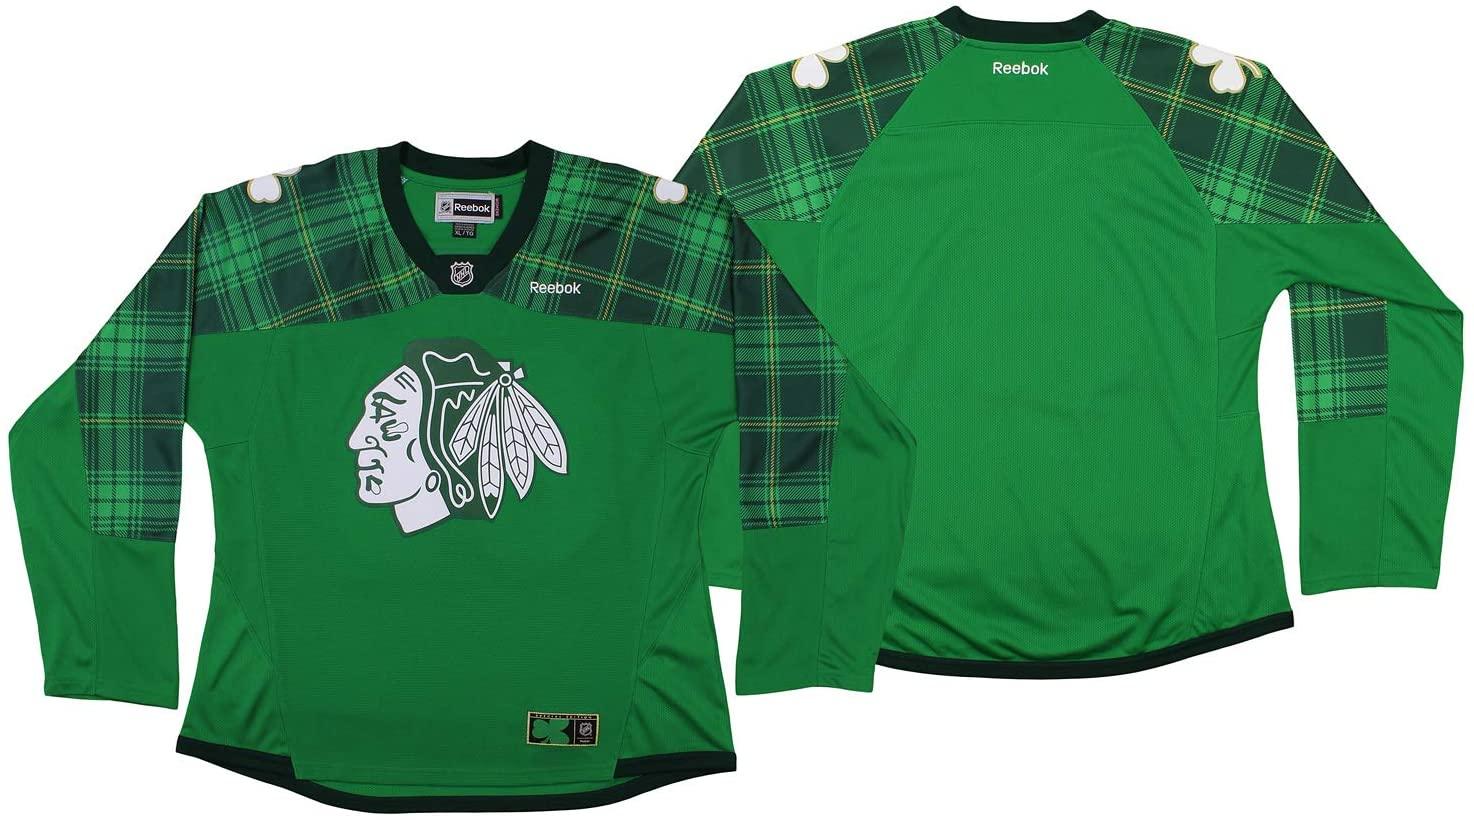 Reebok Chicago Blackhawks NHL Women's St. Patty's Day Jersey, Green